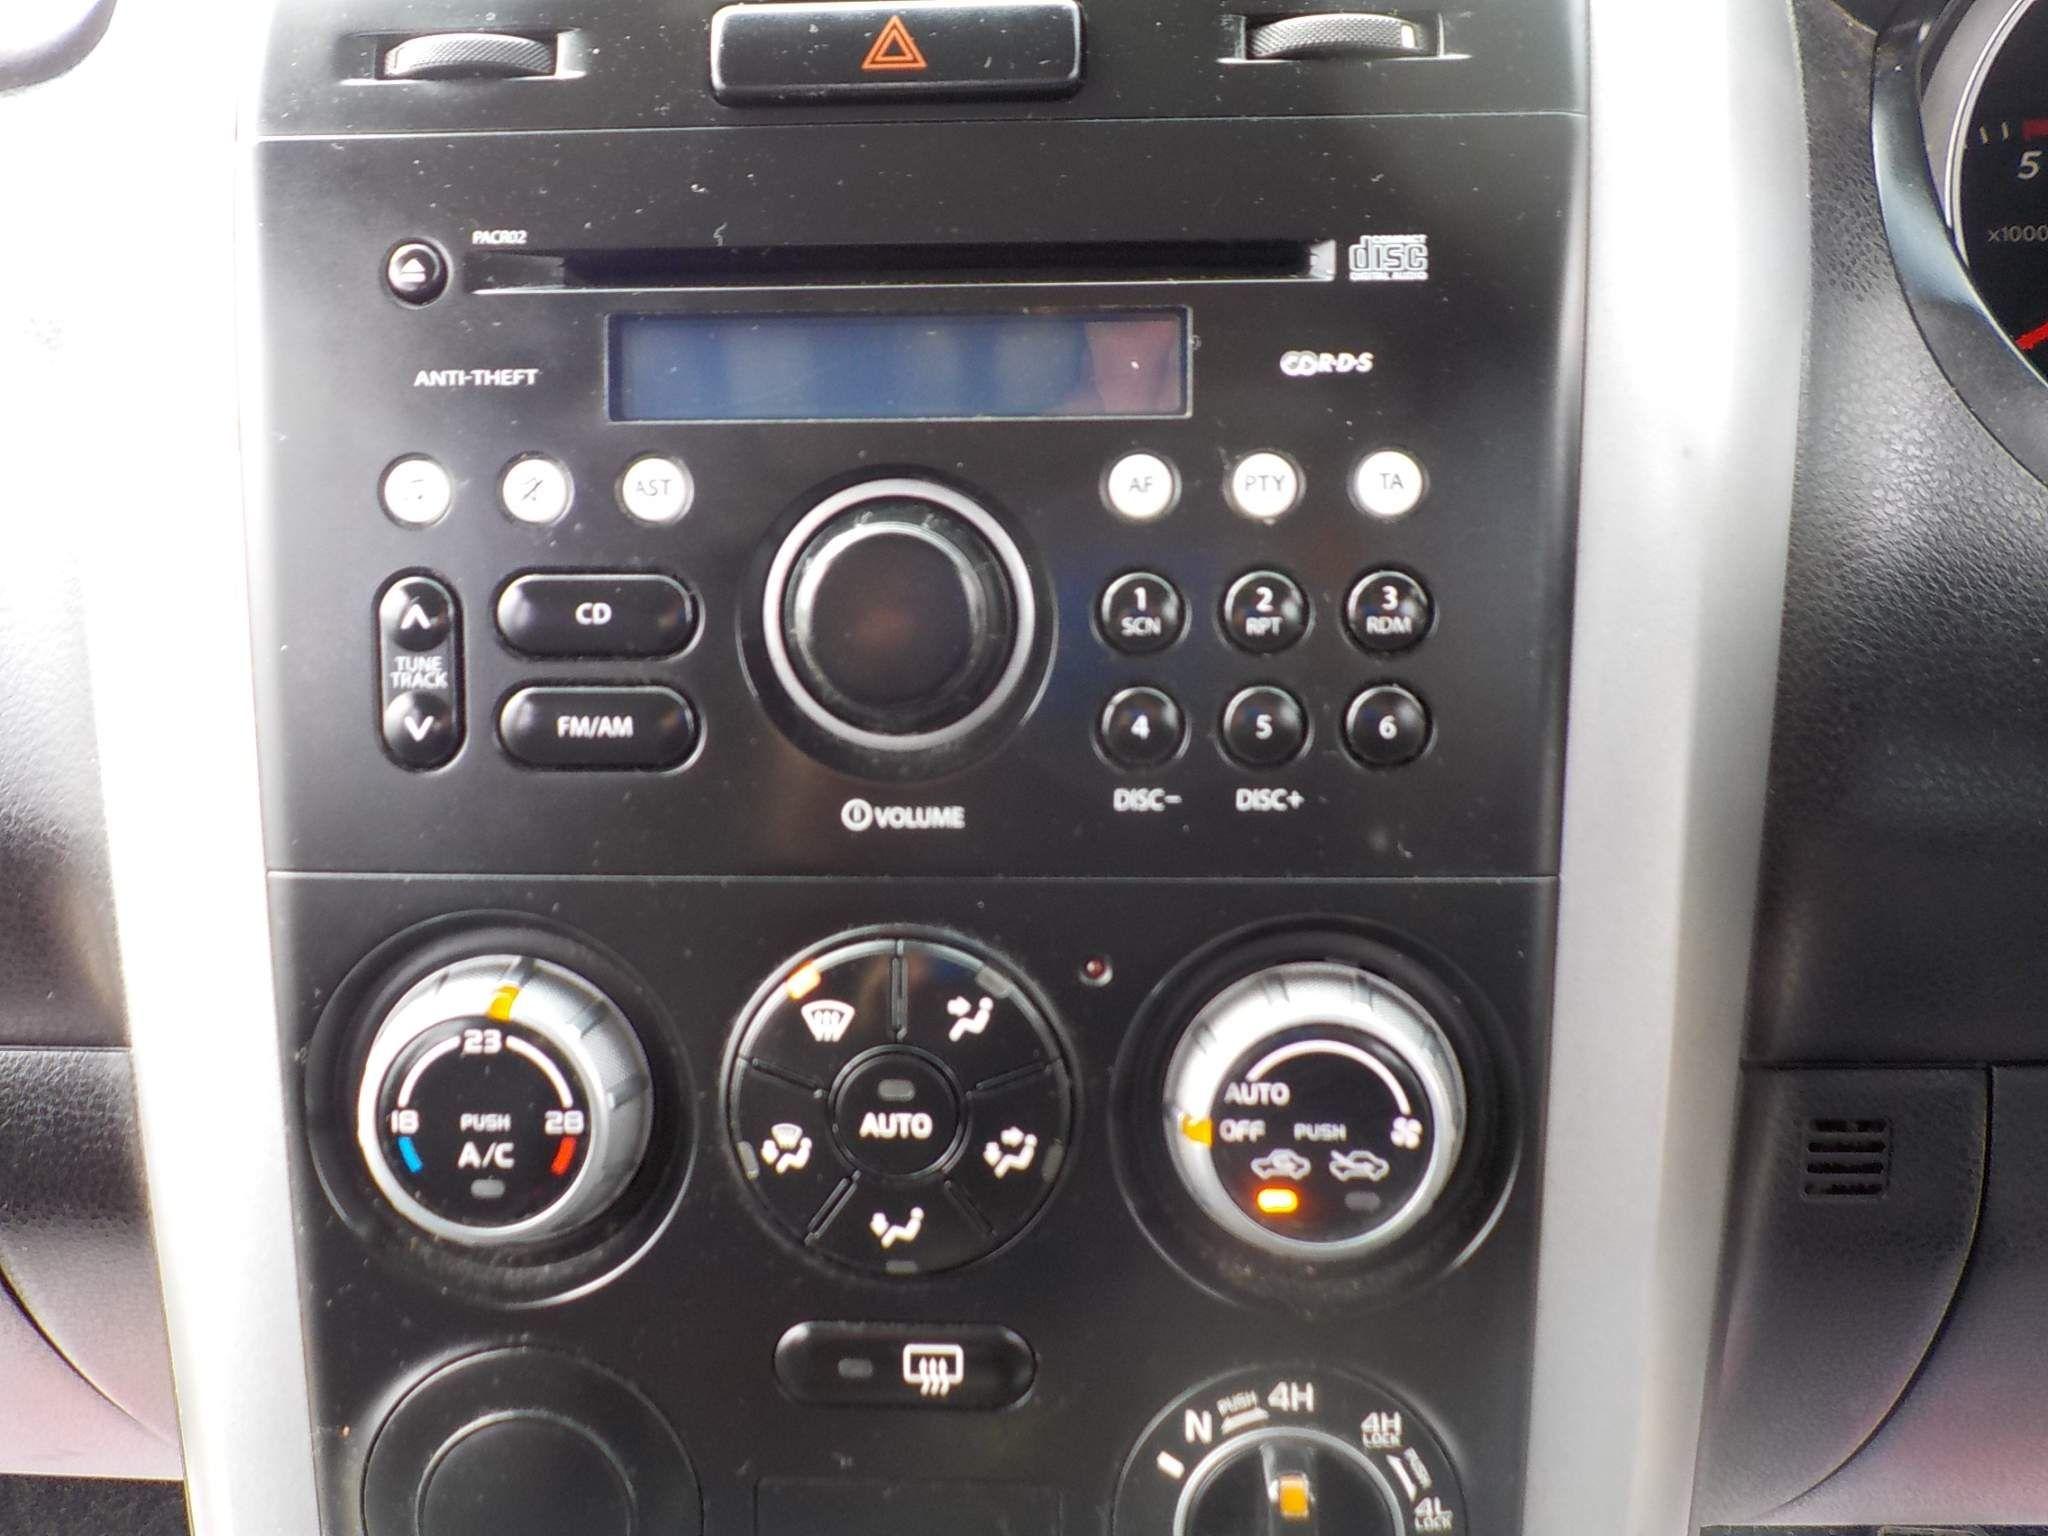 Suzuki Grand Vitara 1.9 DDiS 5dr